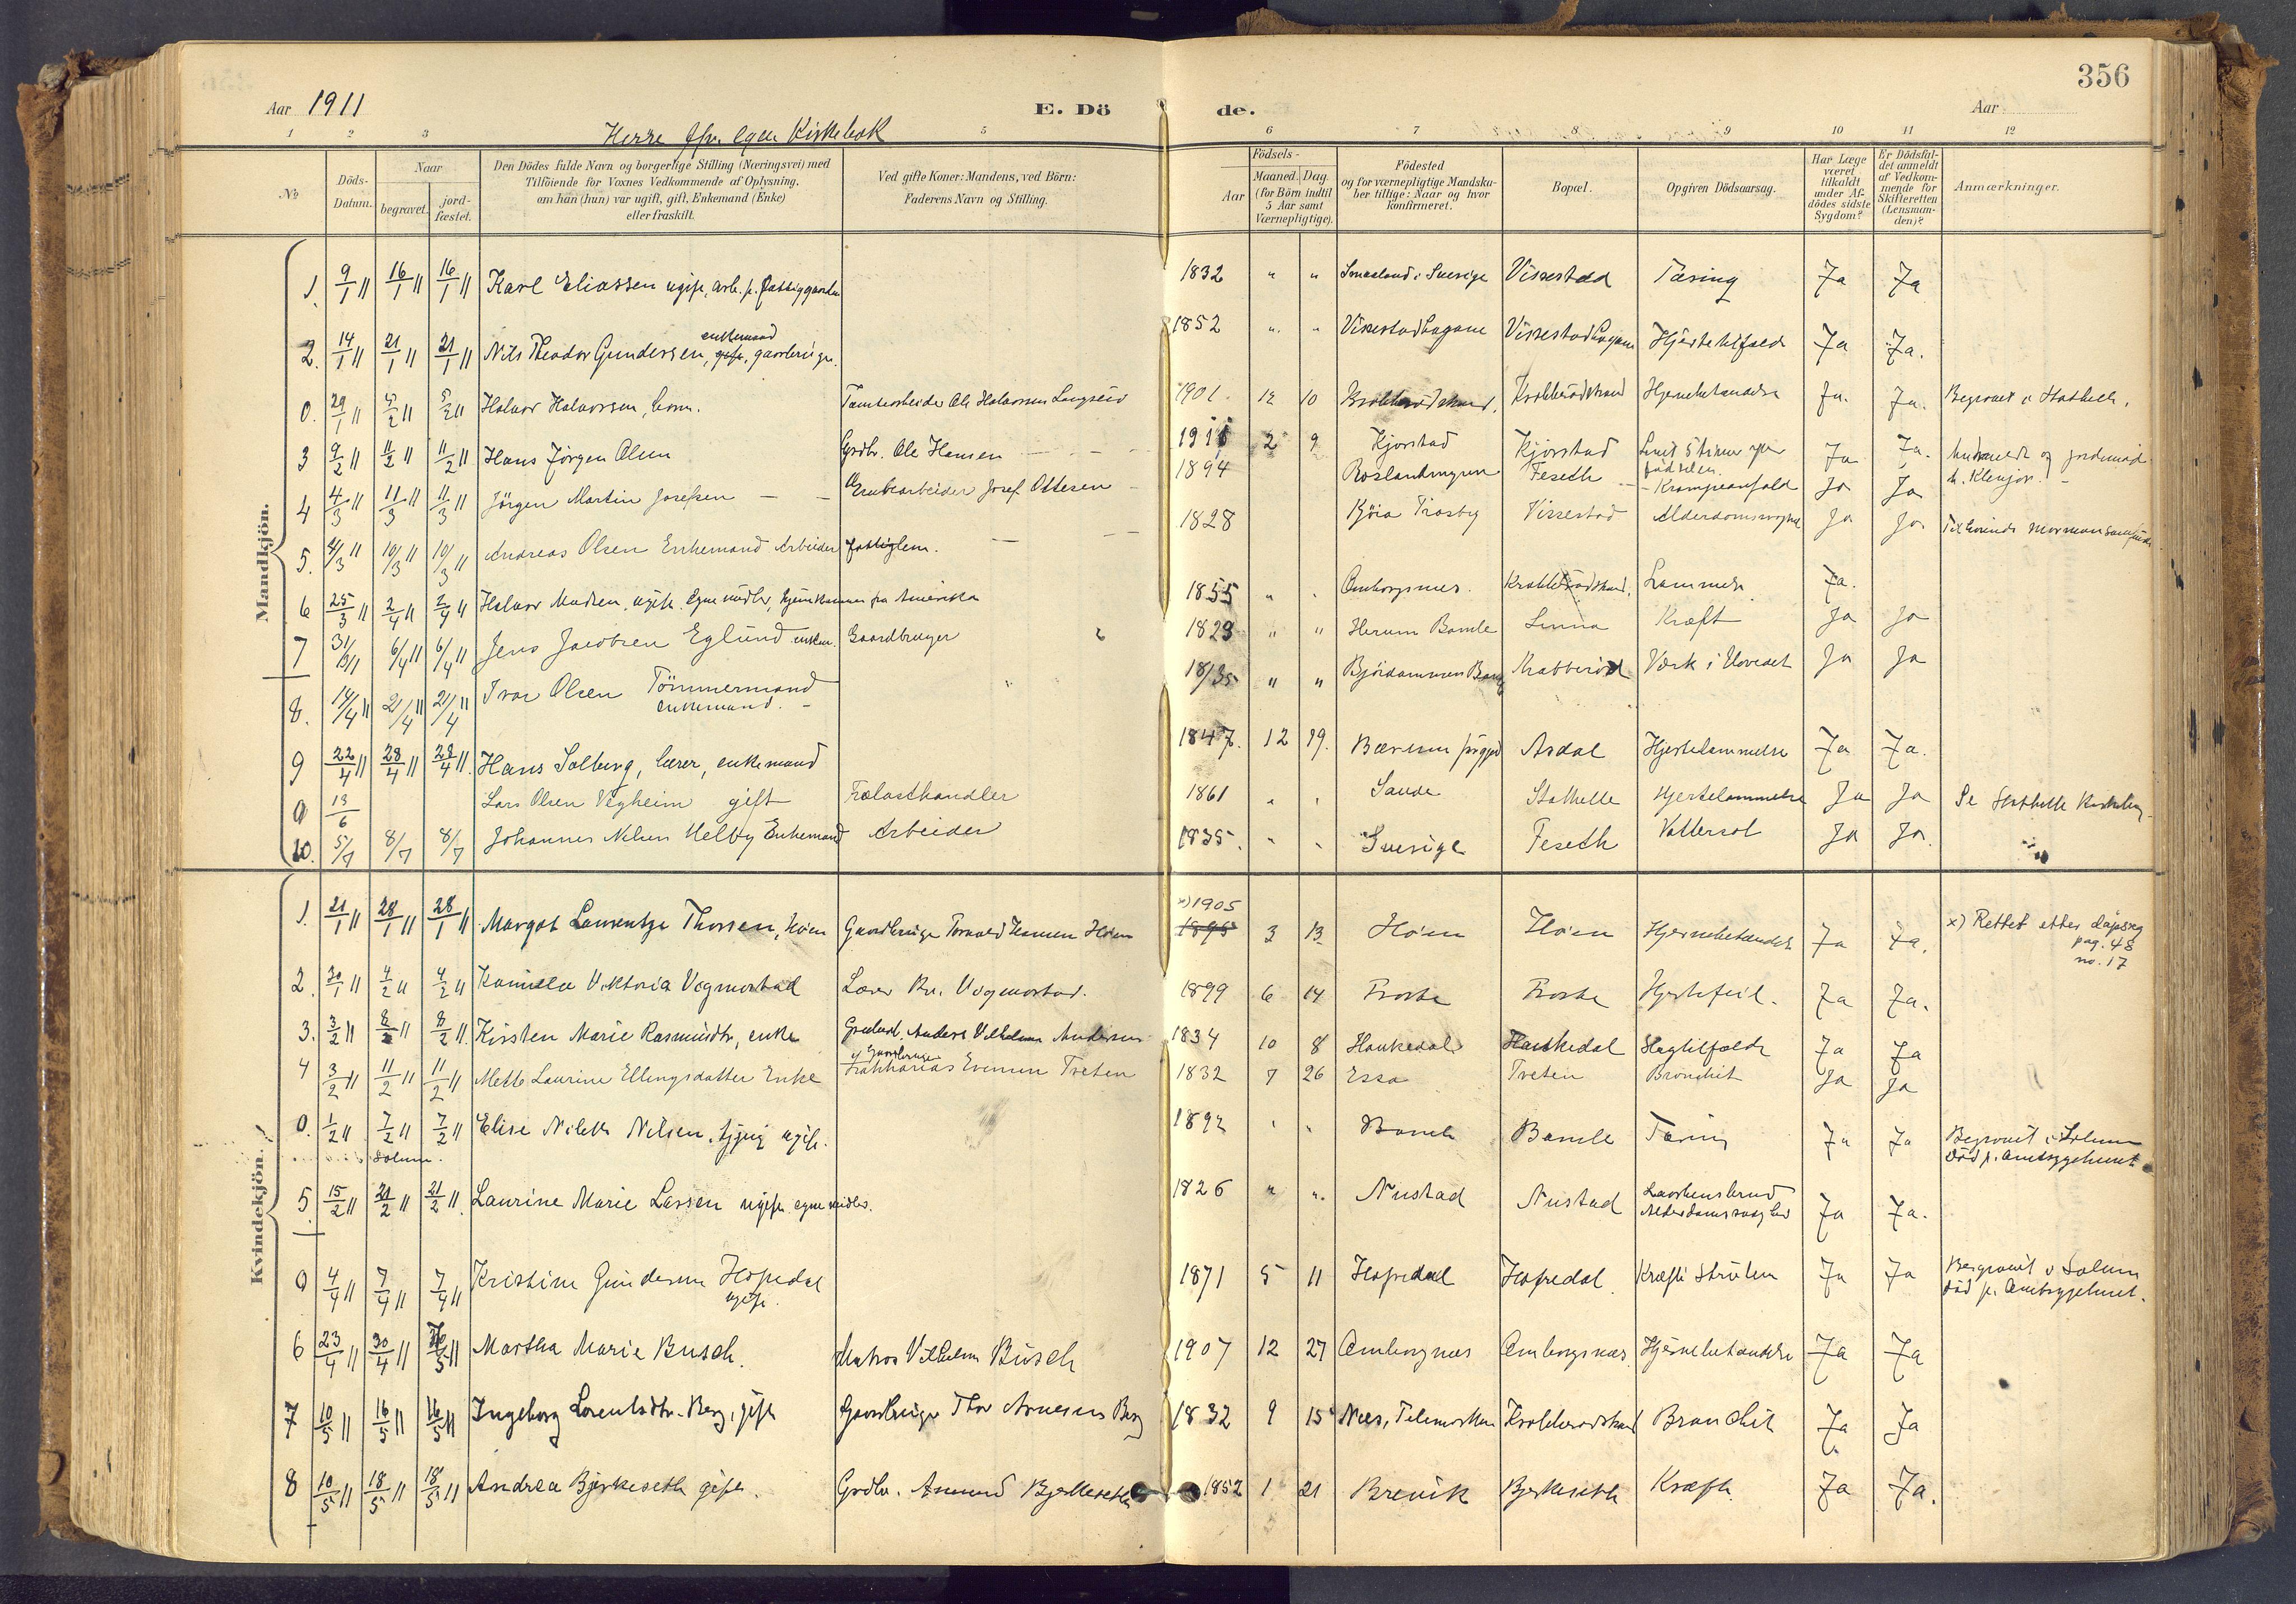 SAKO, Bamble kirkebøker, F/Fa/L0009: Ministerialbok nr. I 9, 1901-1917, s. 356